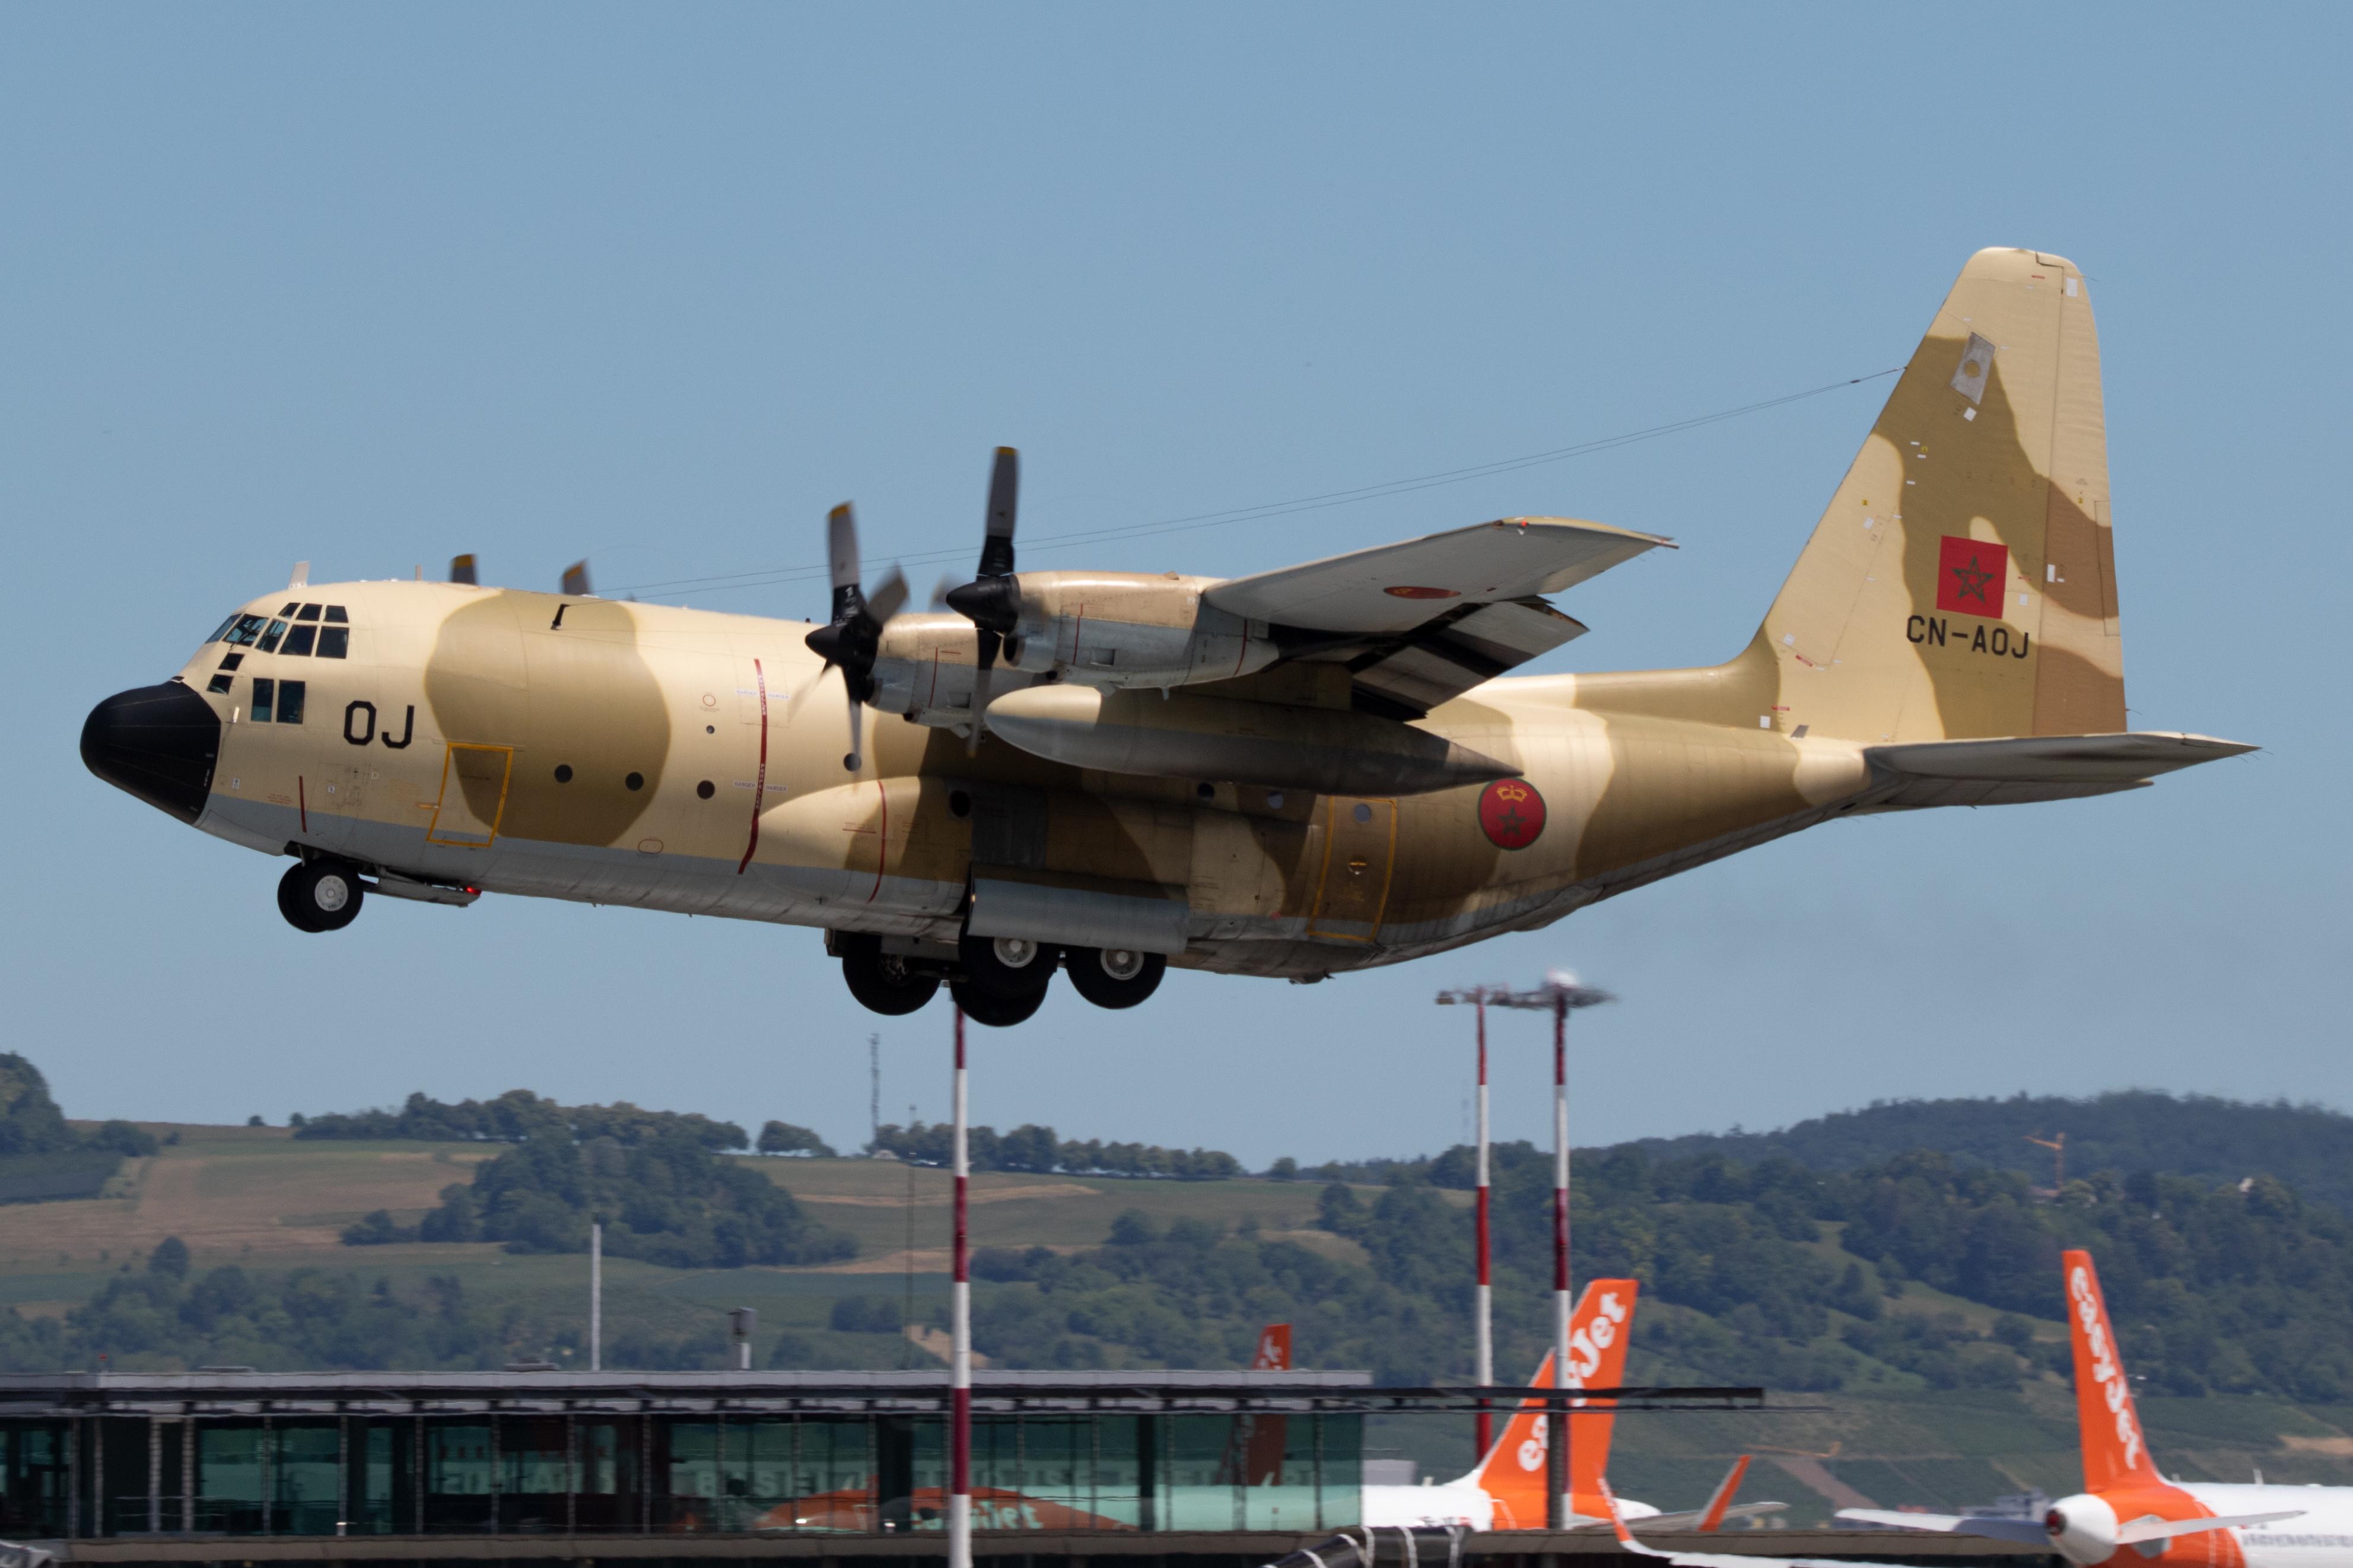 FRA: Photos d'avions de transport - Page 40 50001935308_dc65eaa0c6_o_d